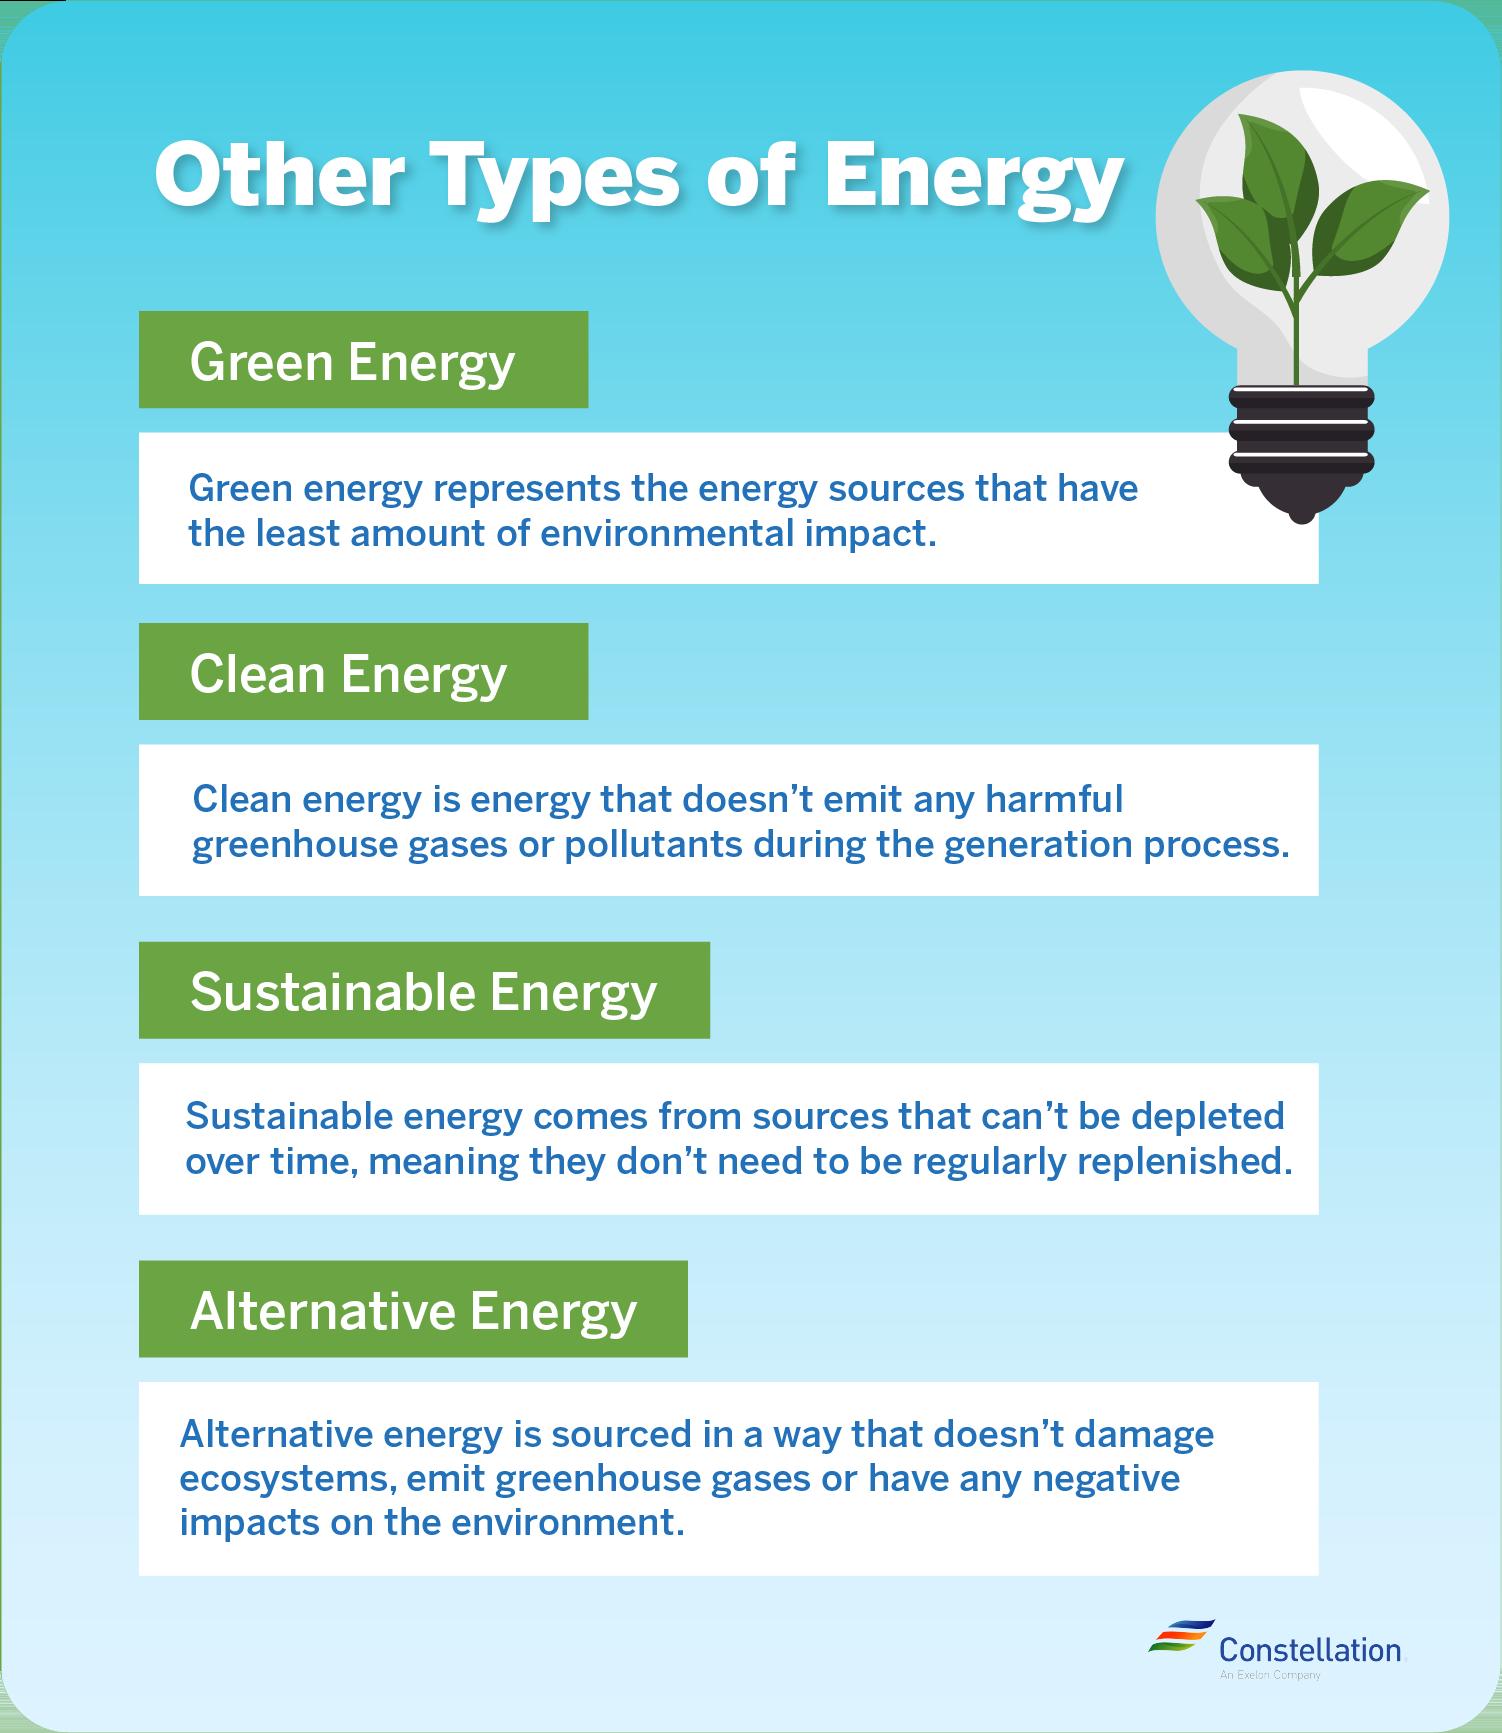 Other types of energy: green energy, clean energy, sustainable energy, alternative energy